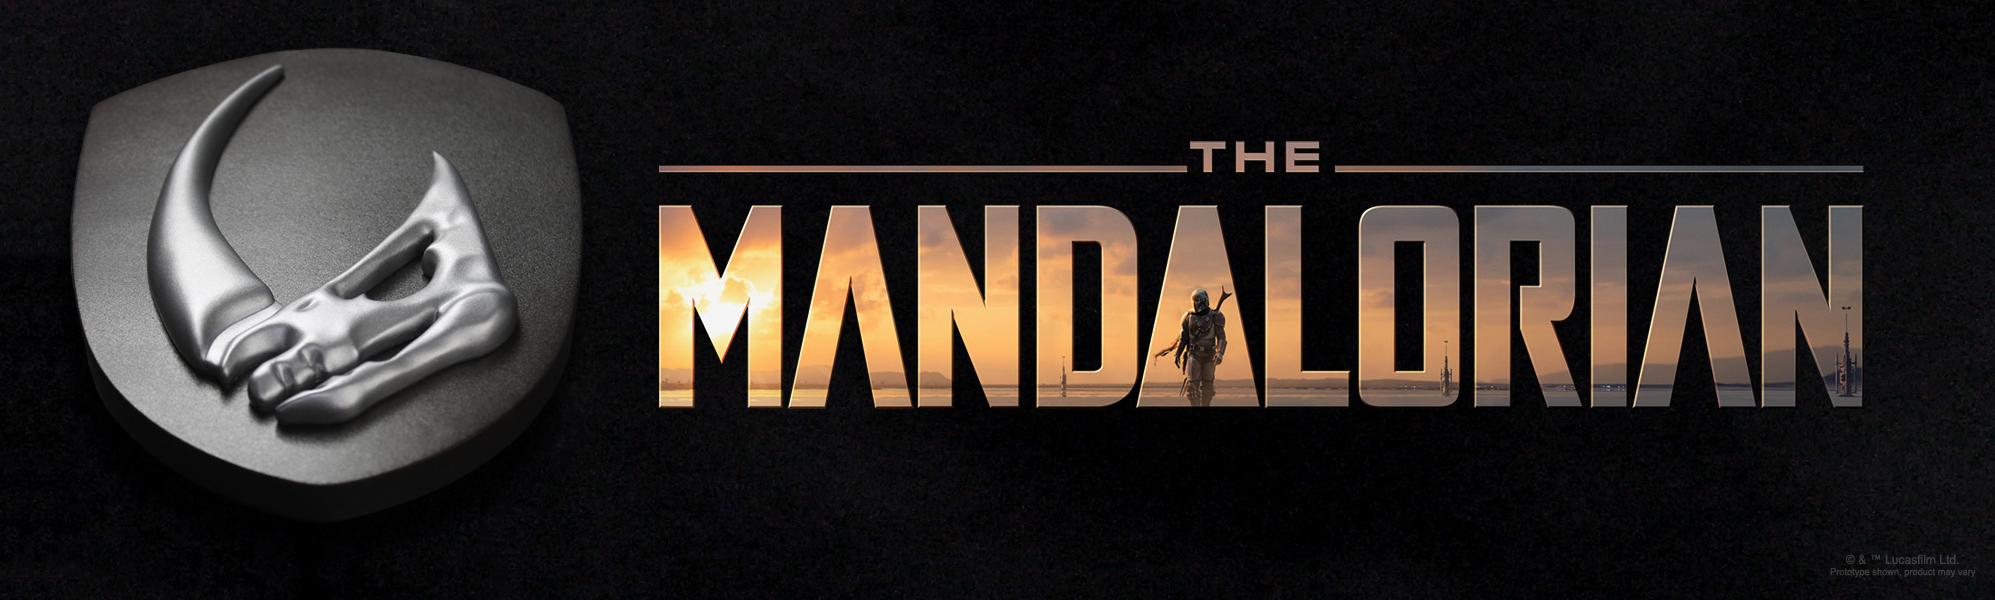 The Mandalorian's mudhorn signet decor